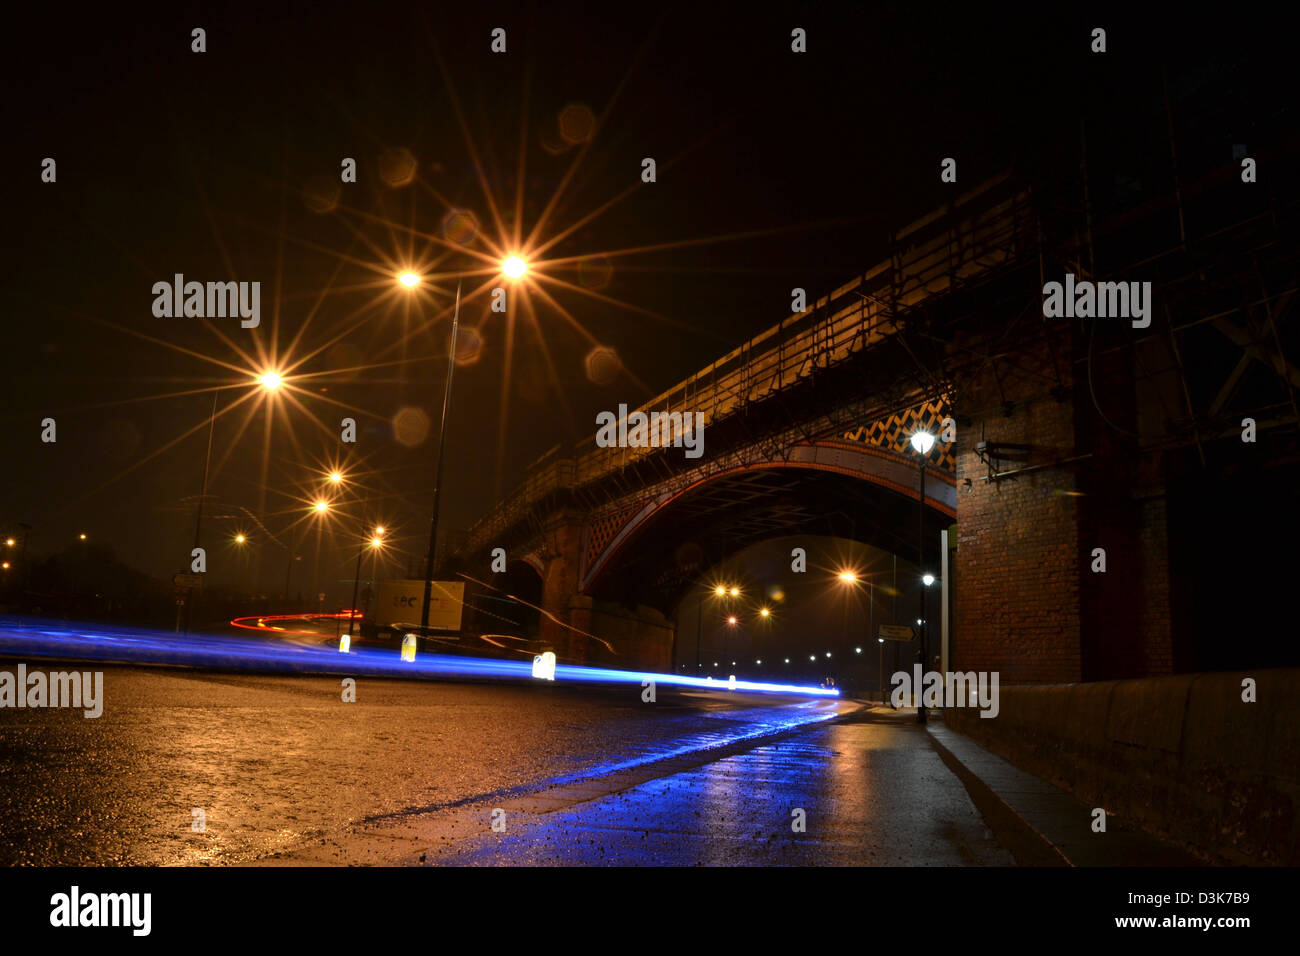 Night scene of car traveling under bridge - Stock Image